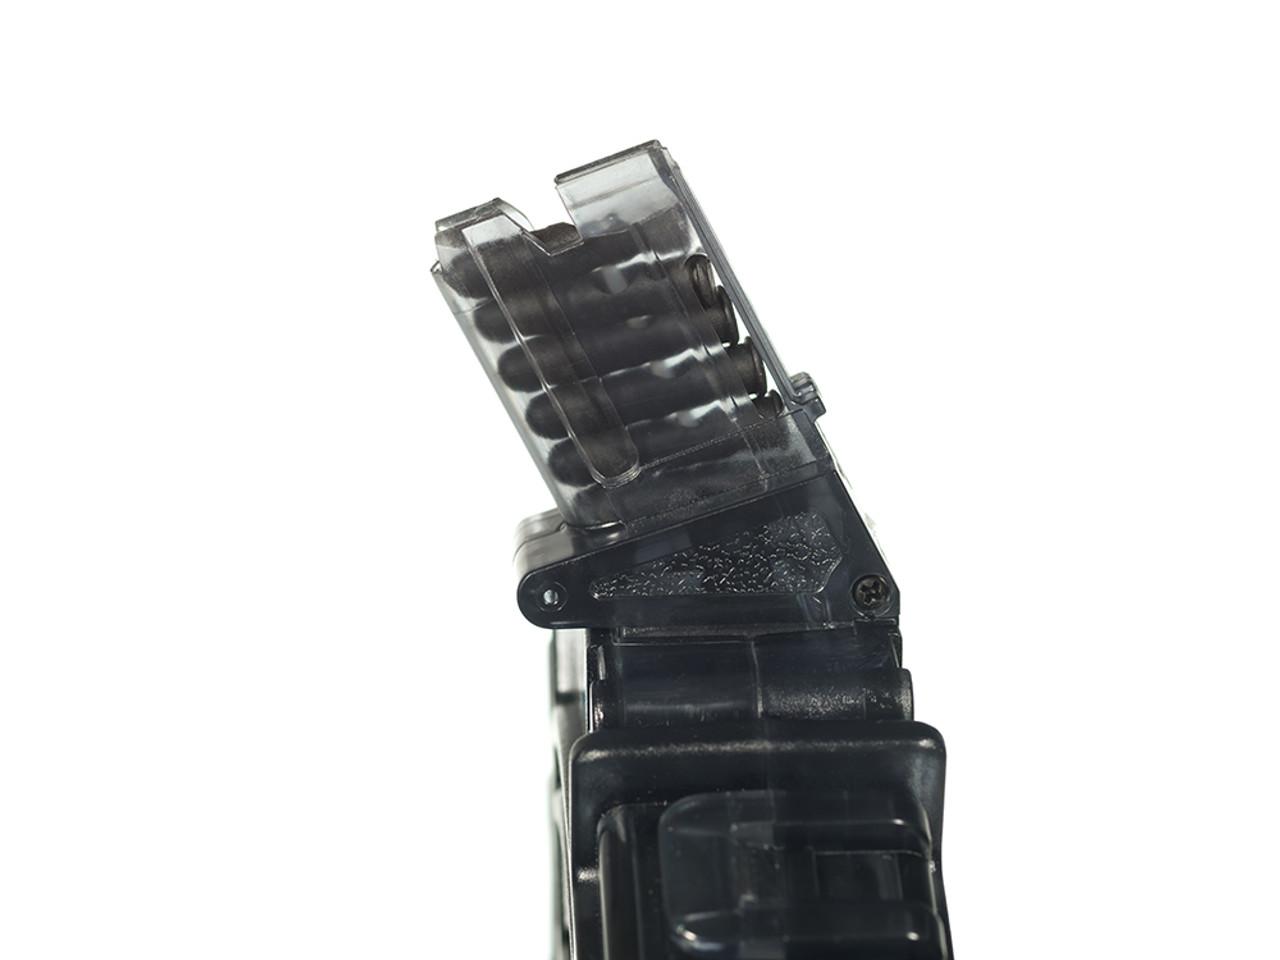 Marlin® 795 .22 LR (70) Rd - Black Polymer Drum